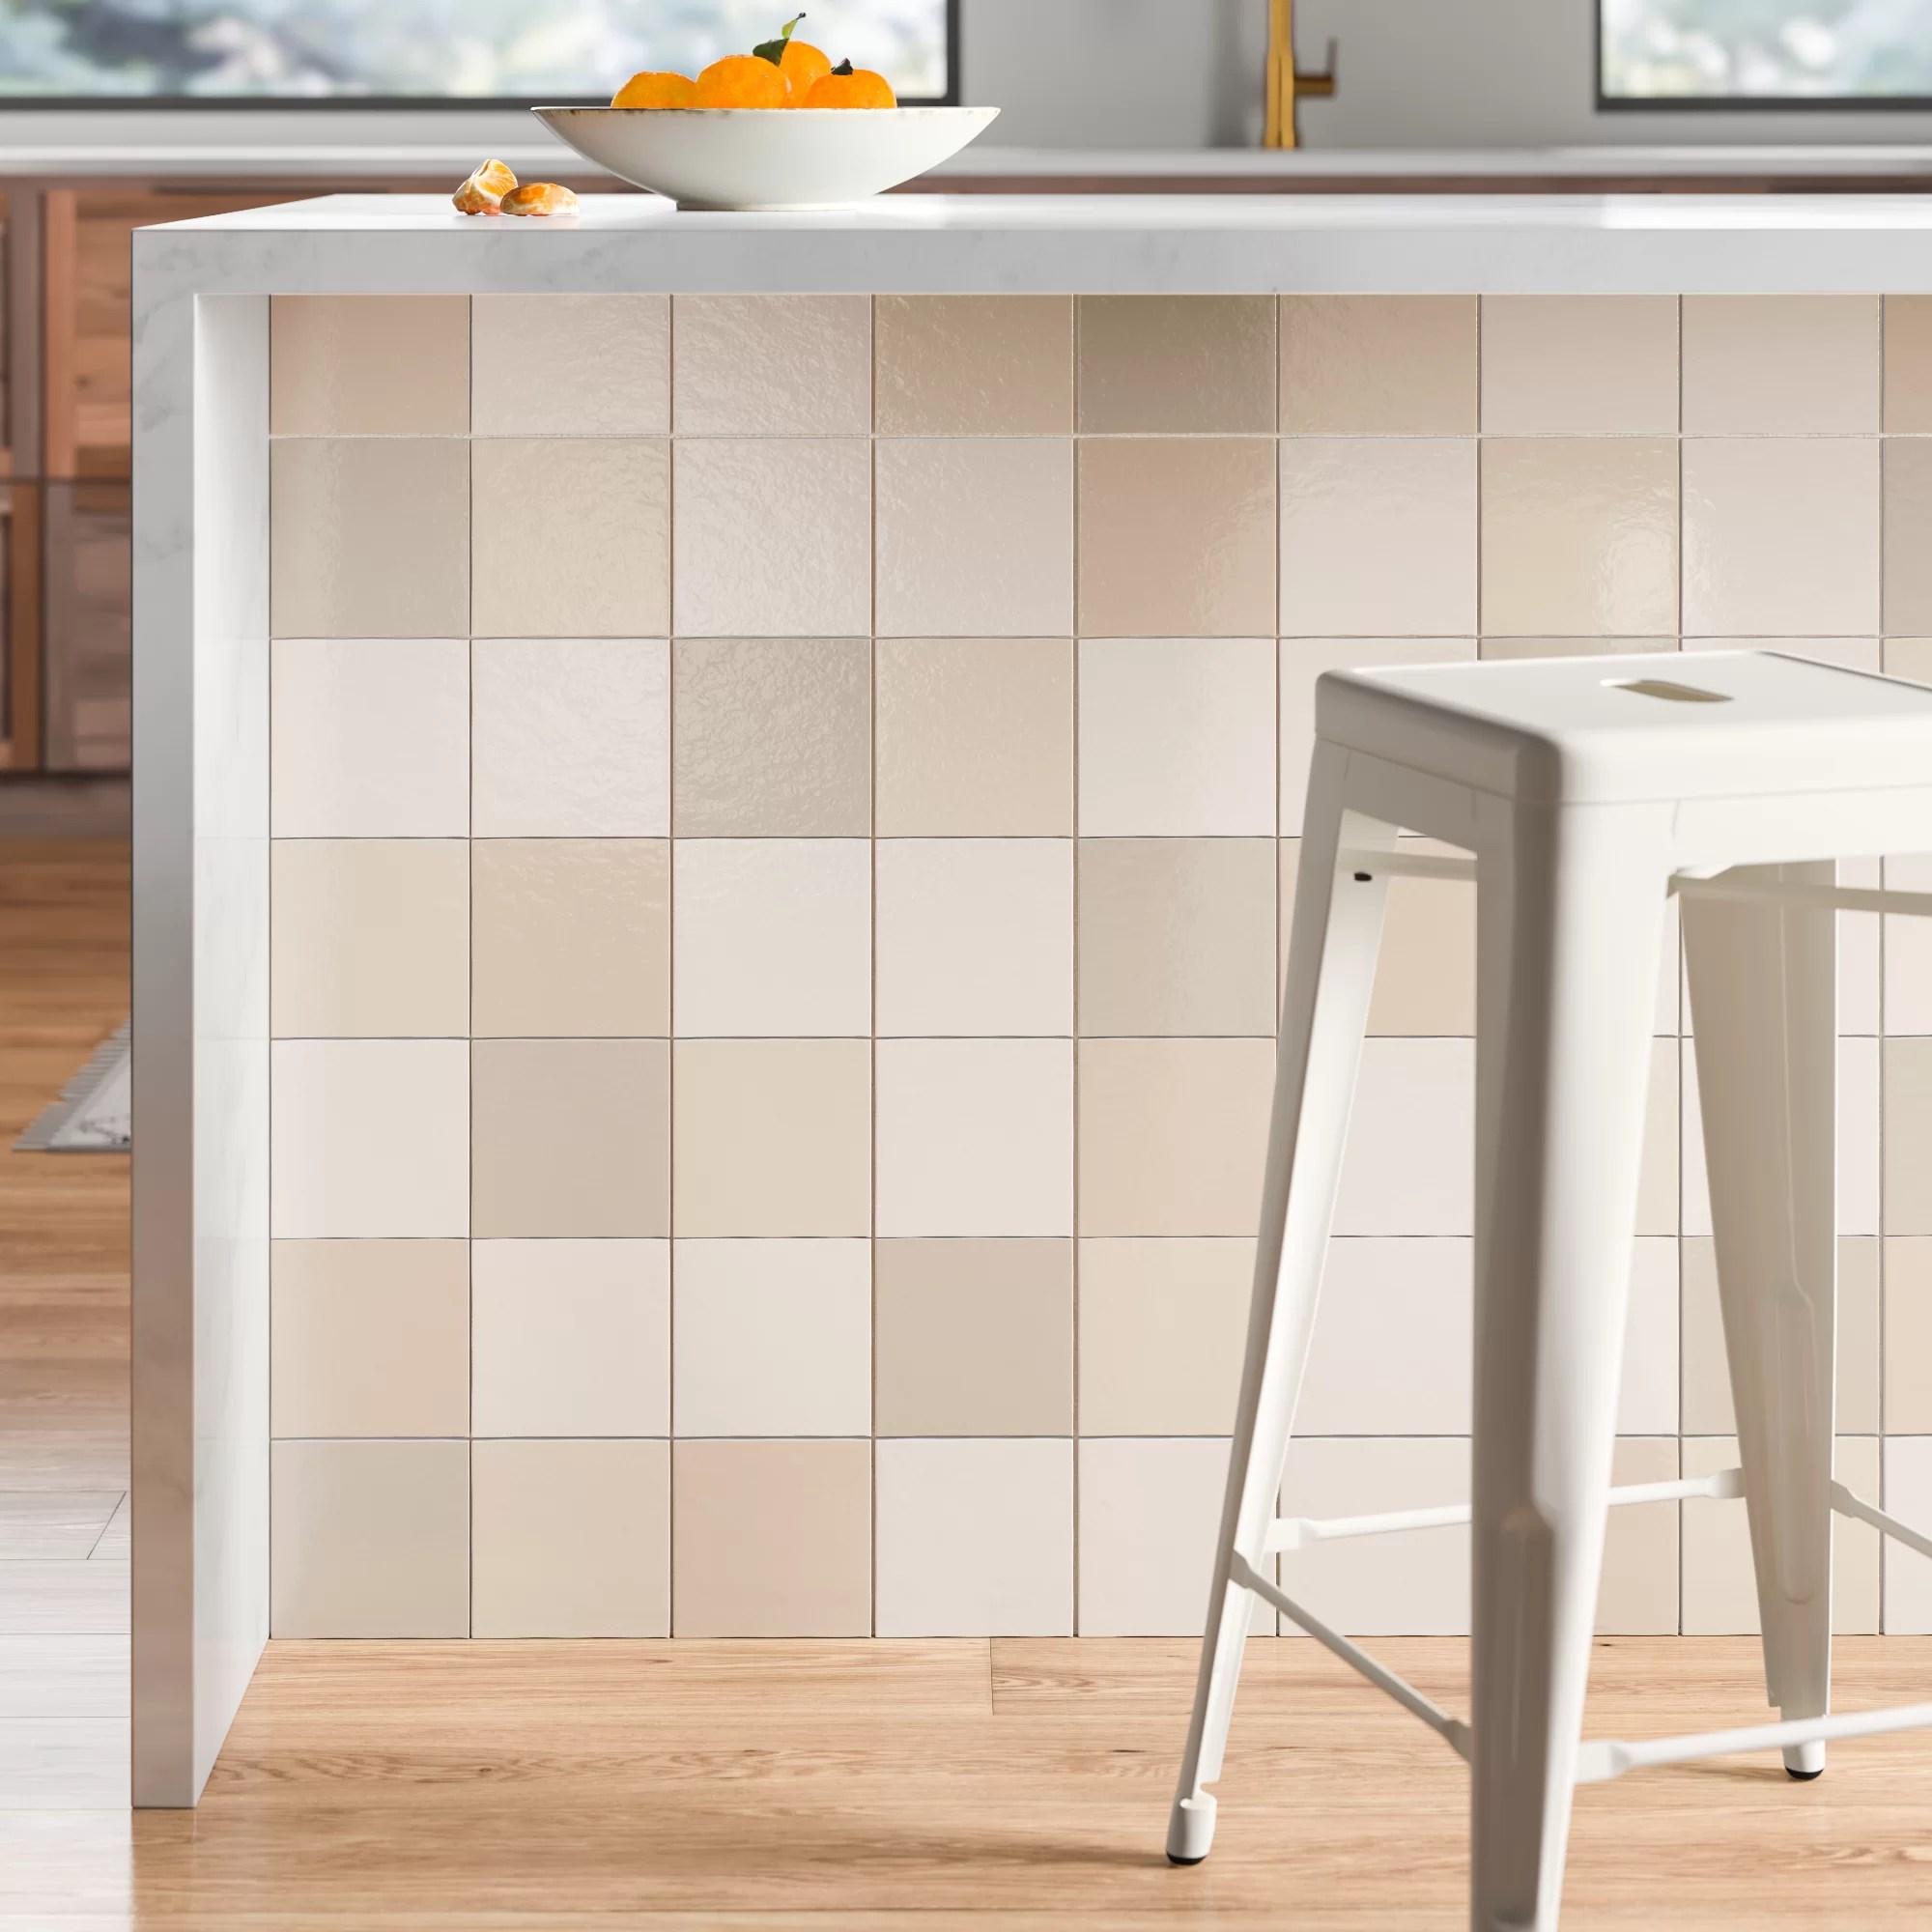 daniels 5 x 5 ceramic mosaic tile in creme